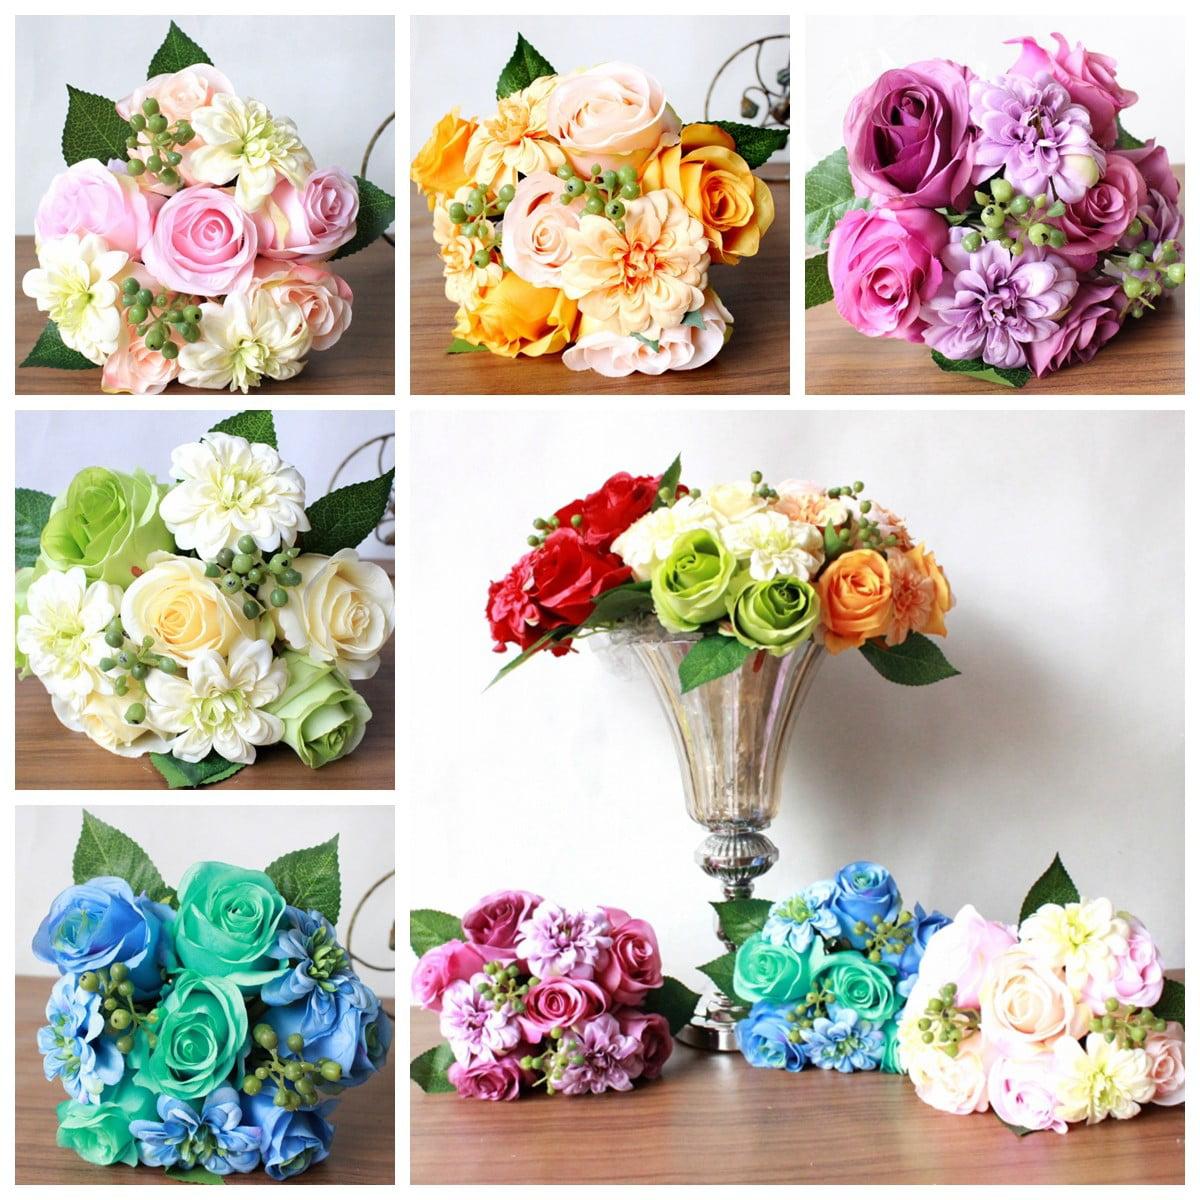 1 Bouquet 9 Heads Artificial decoration Silk Roses Flowers Bouquet Home Wedding Bridal Party Decor